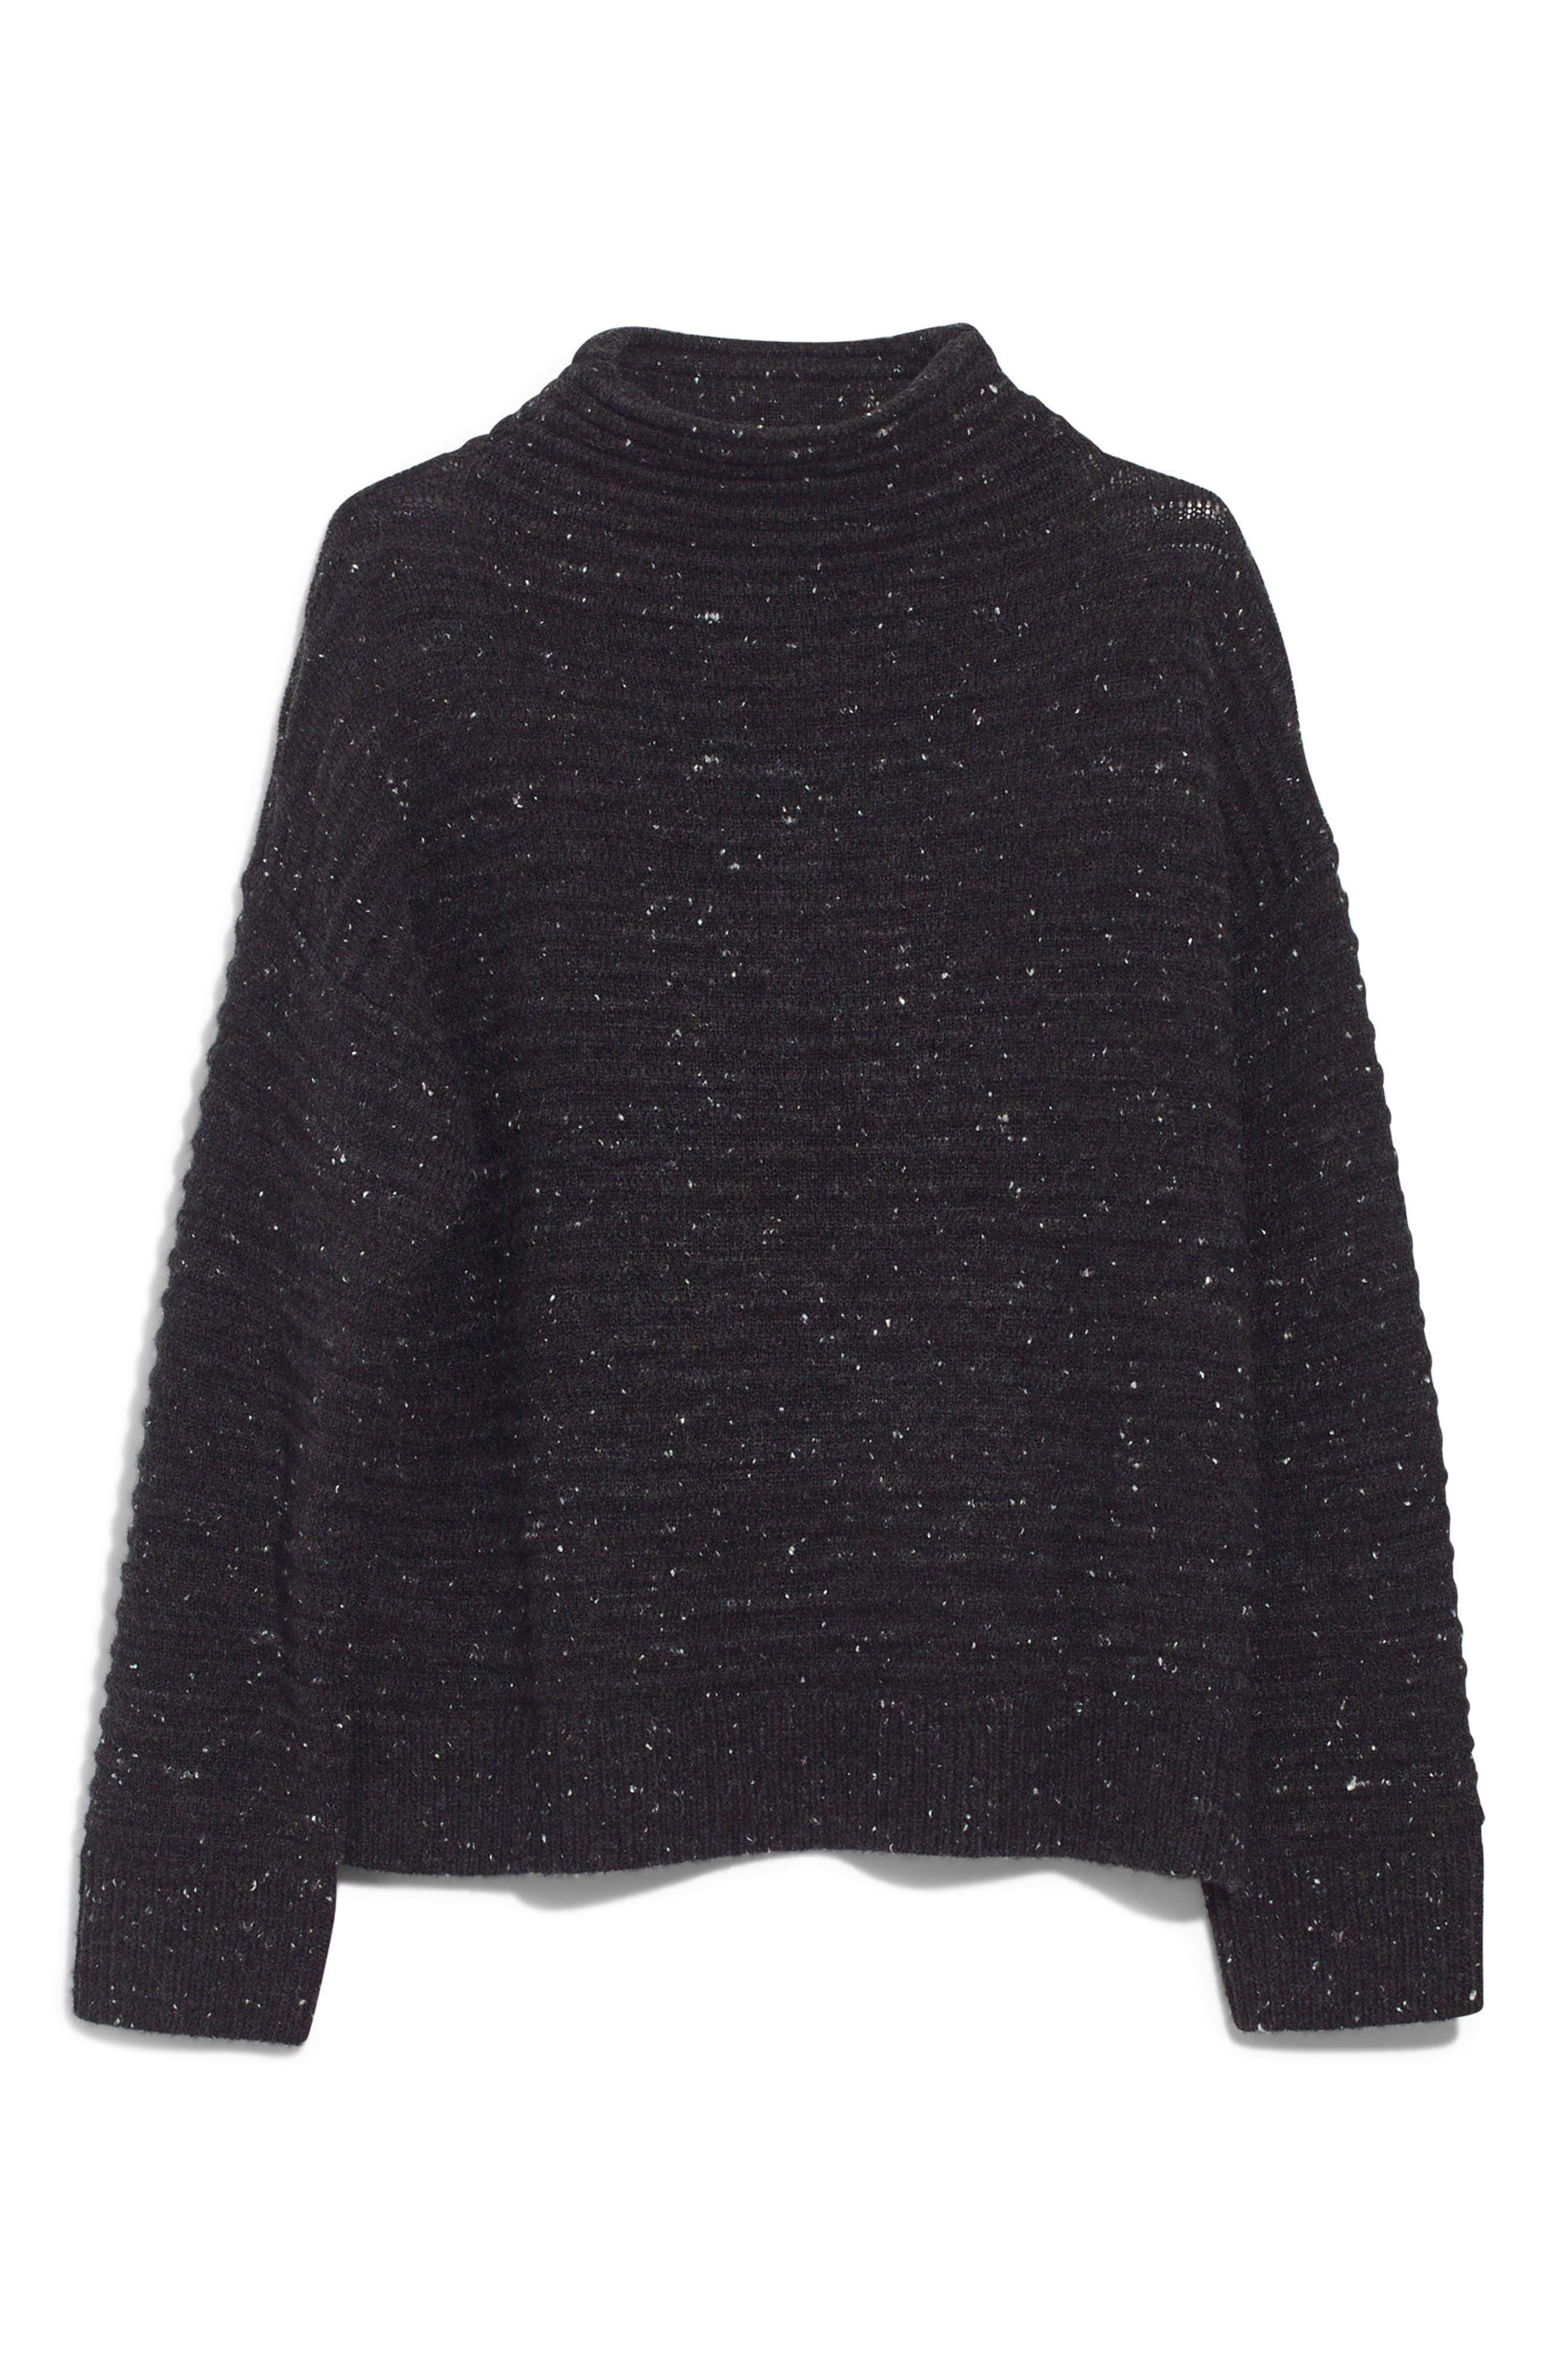 Belmont Donegal Mock Neck Sweater,                             Alternate thumbnail 6, color,                             DONEGAL STORM